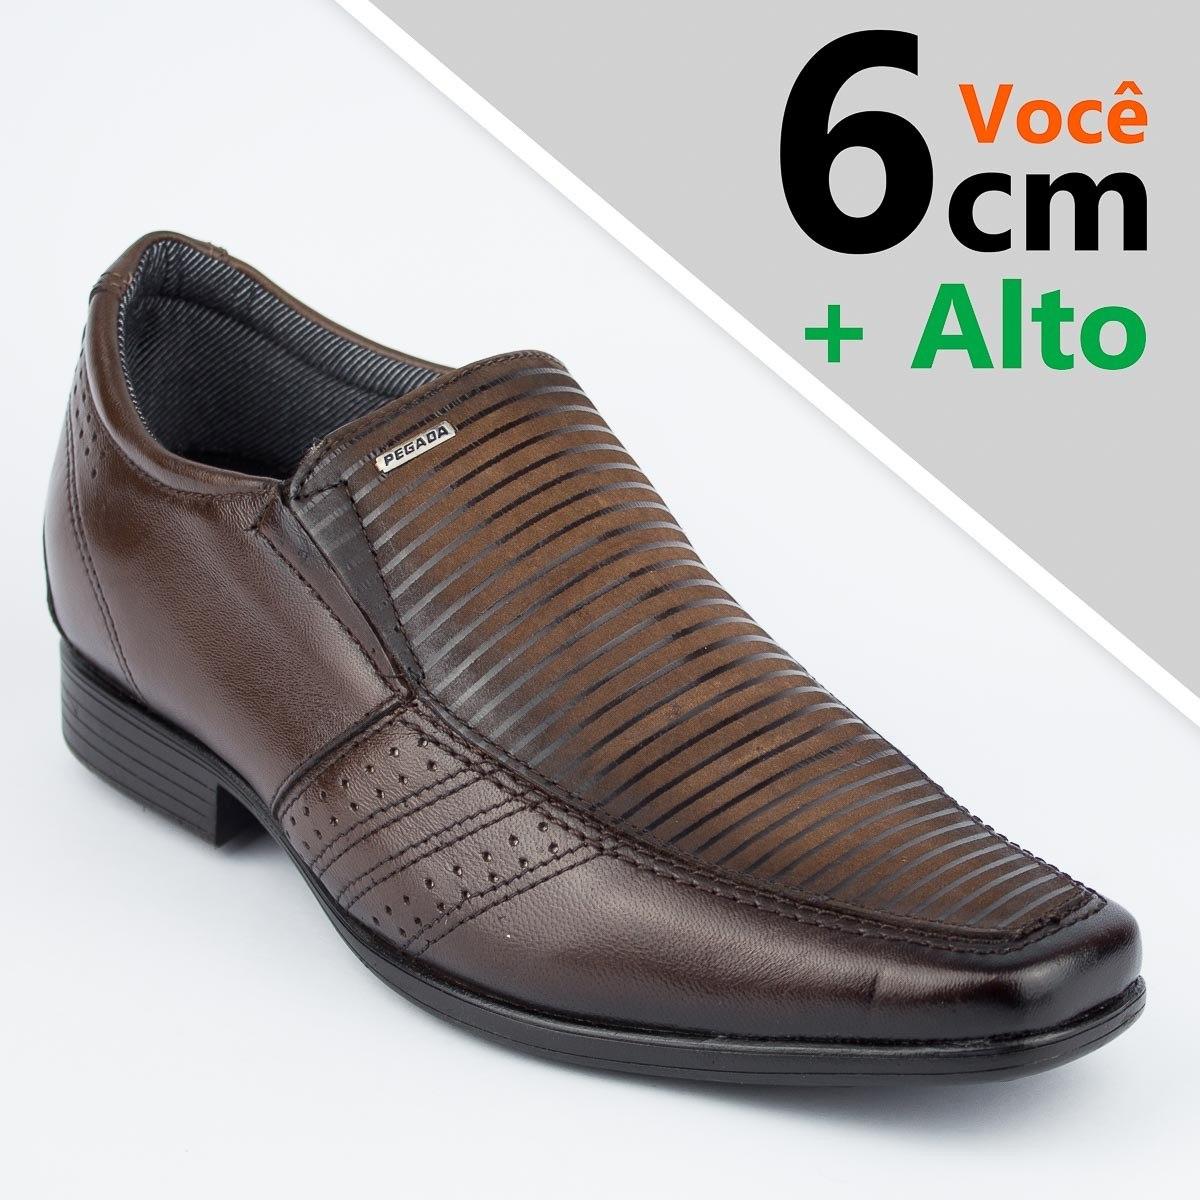 d61cdb222 sapato social masculino pegada aumenta altura couro nf tc. Carregando zoom.